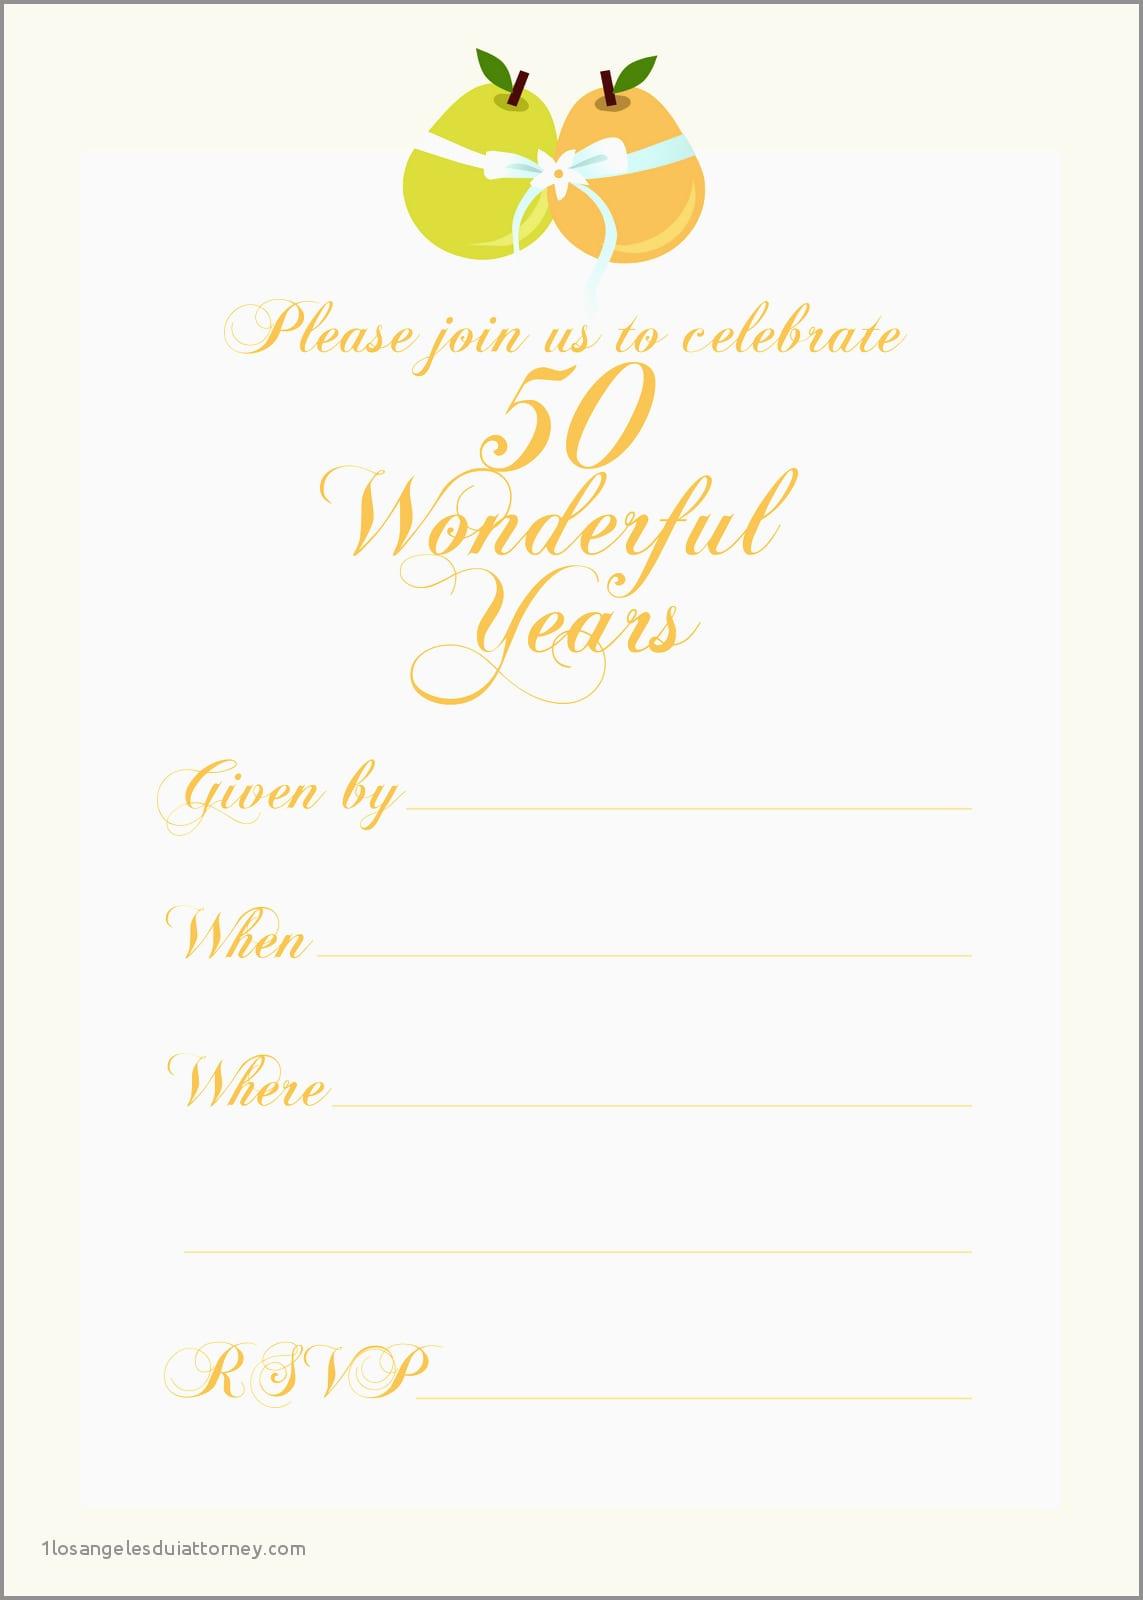 Wedding Invitation Wording In Spanish Lovely Anniversary Invitations Wording Spanish